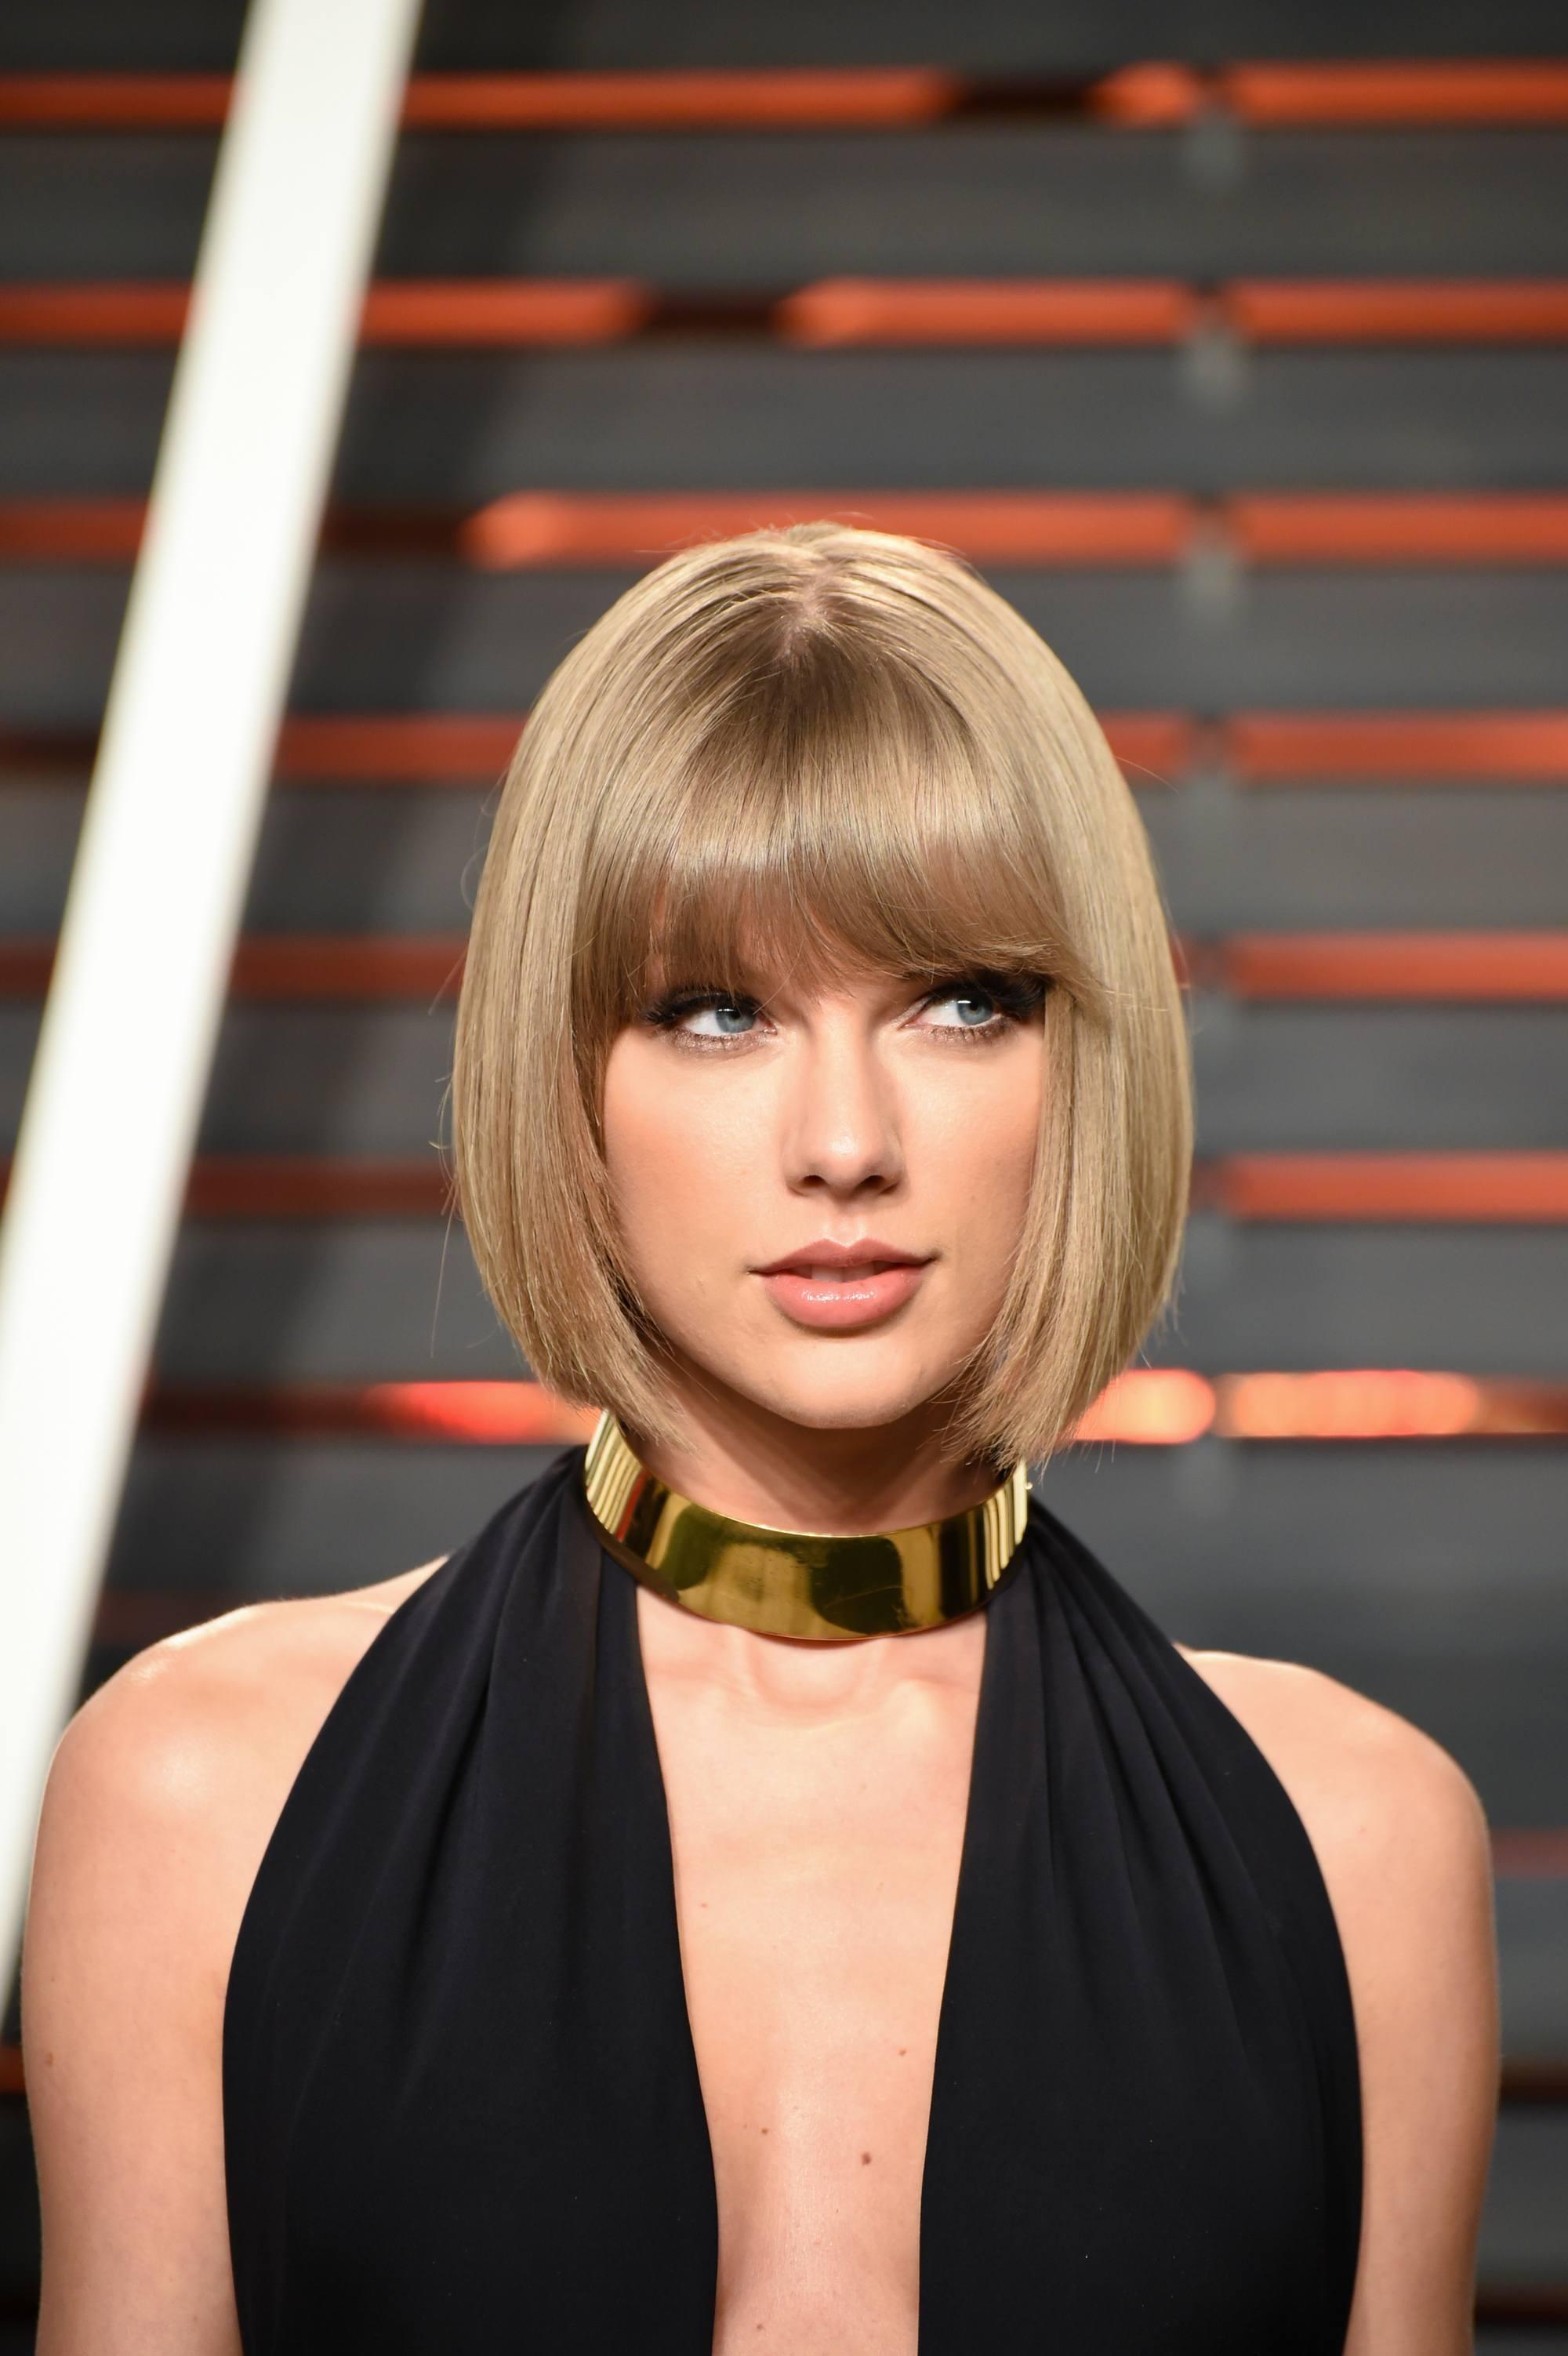 Taylor Swift con cabellera ultra lacia a la altura de la mandibula y flequillo